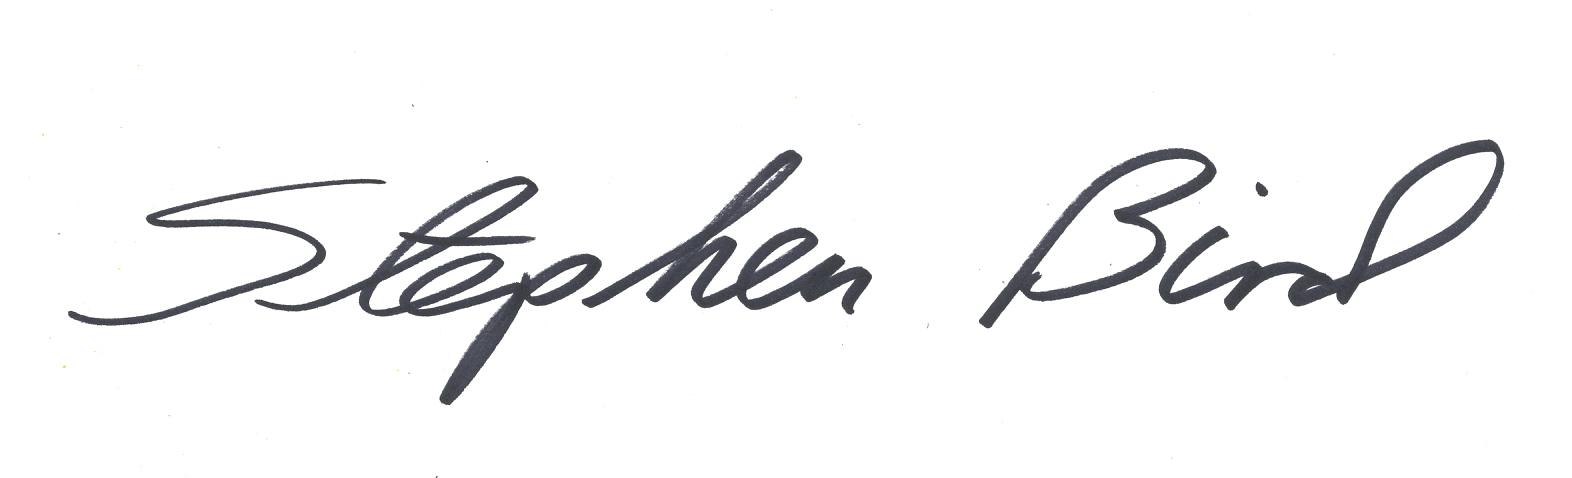 Stephen Bird's Signature